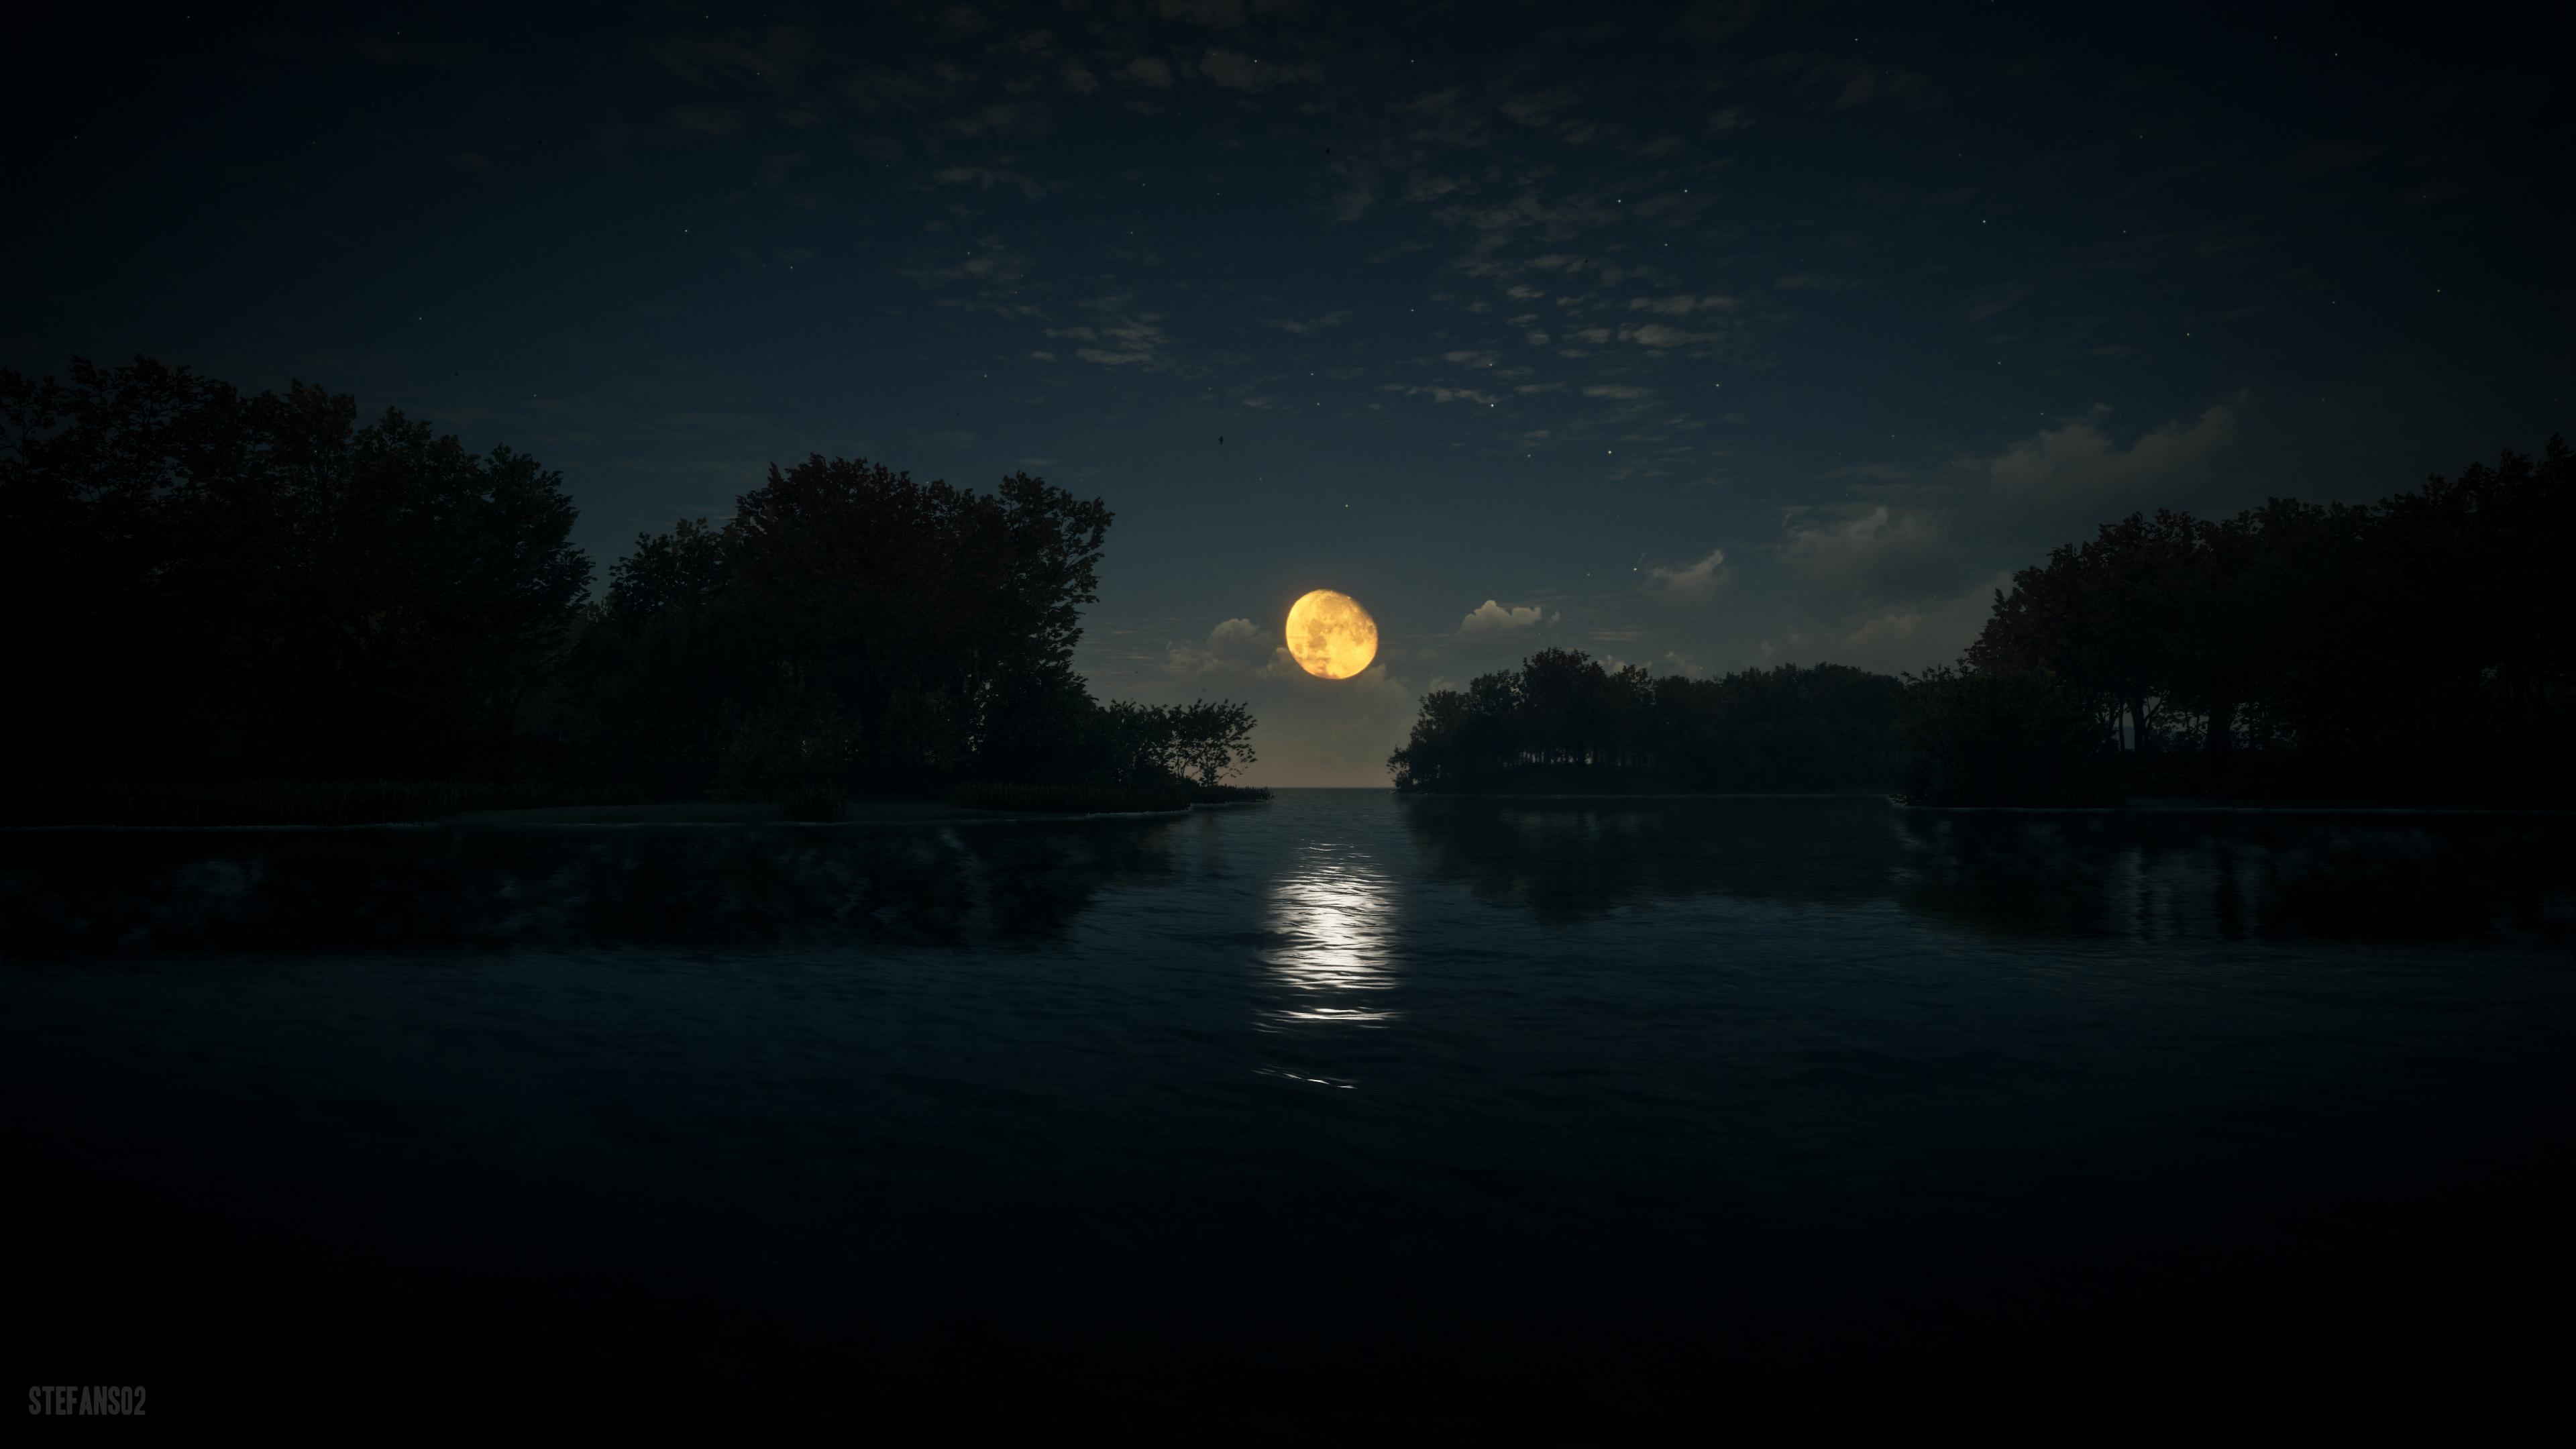 River Stream Dark 4k, HD Nature, 4k Wallpapers, Images ...